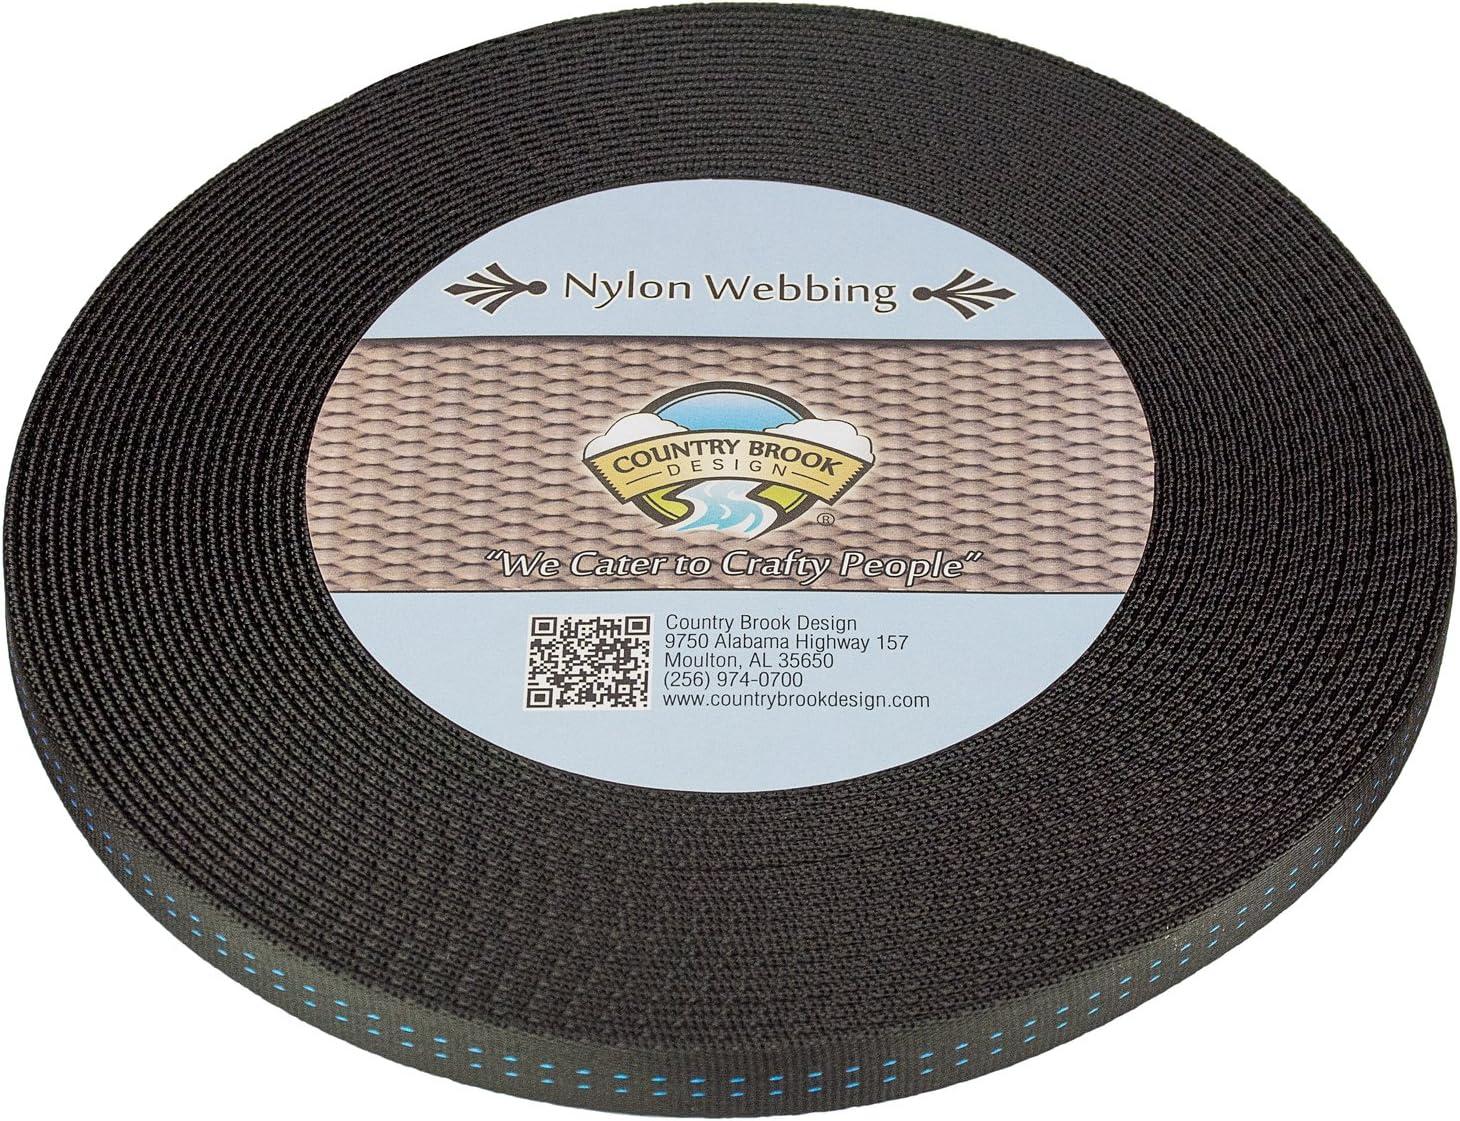 Military Spec Tubular Nylon Webbing Country Brook Design Black, 5//8 Inch